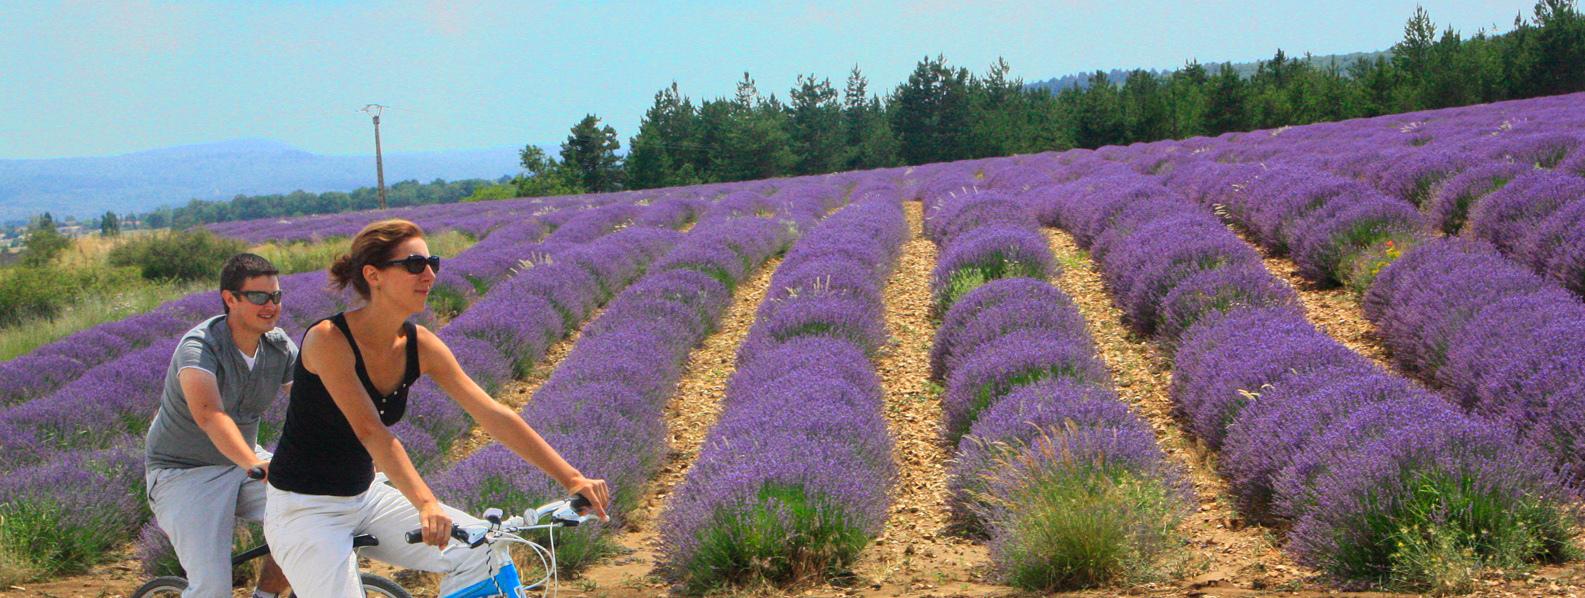 Provence cycling road